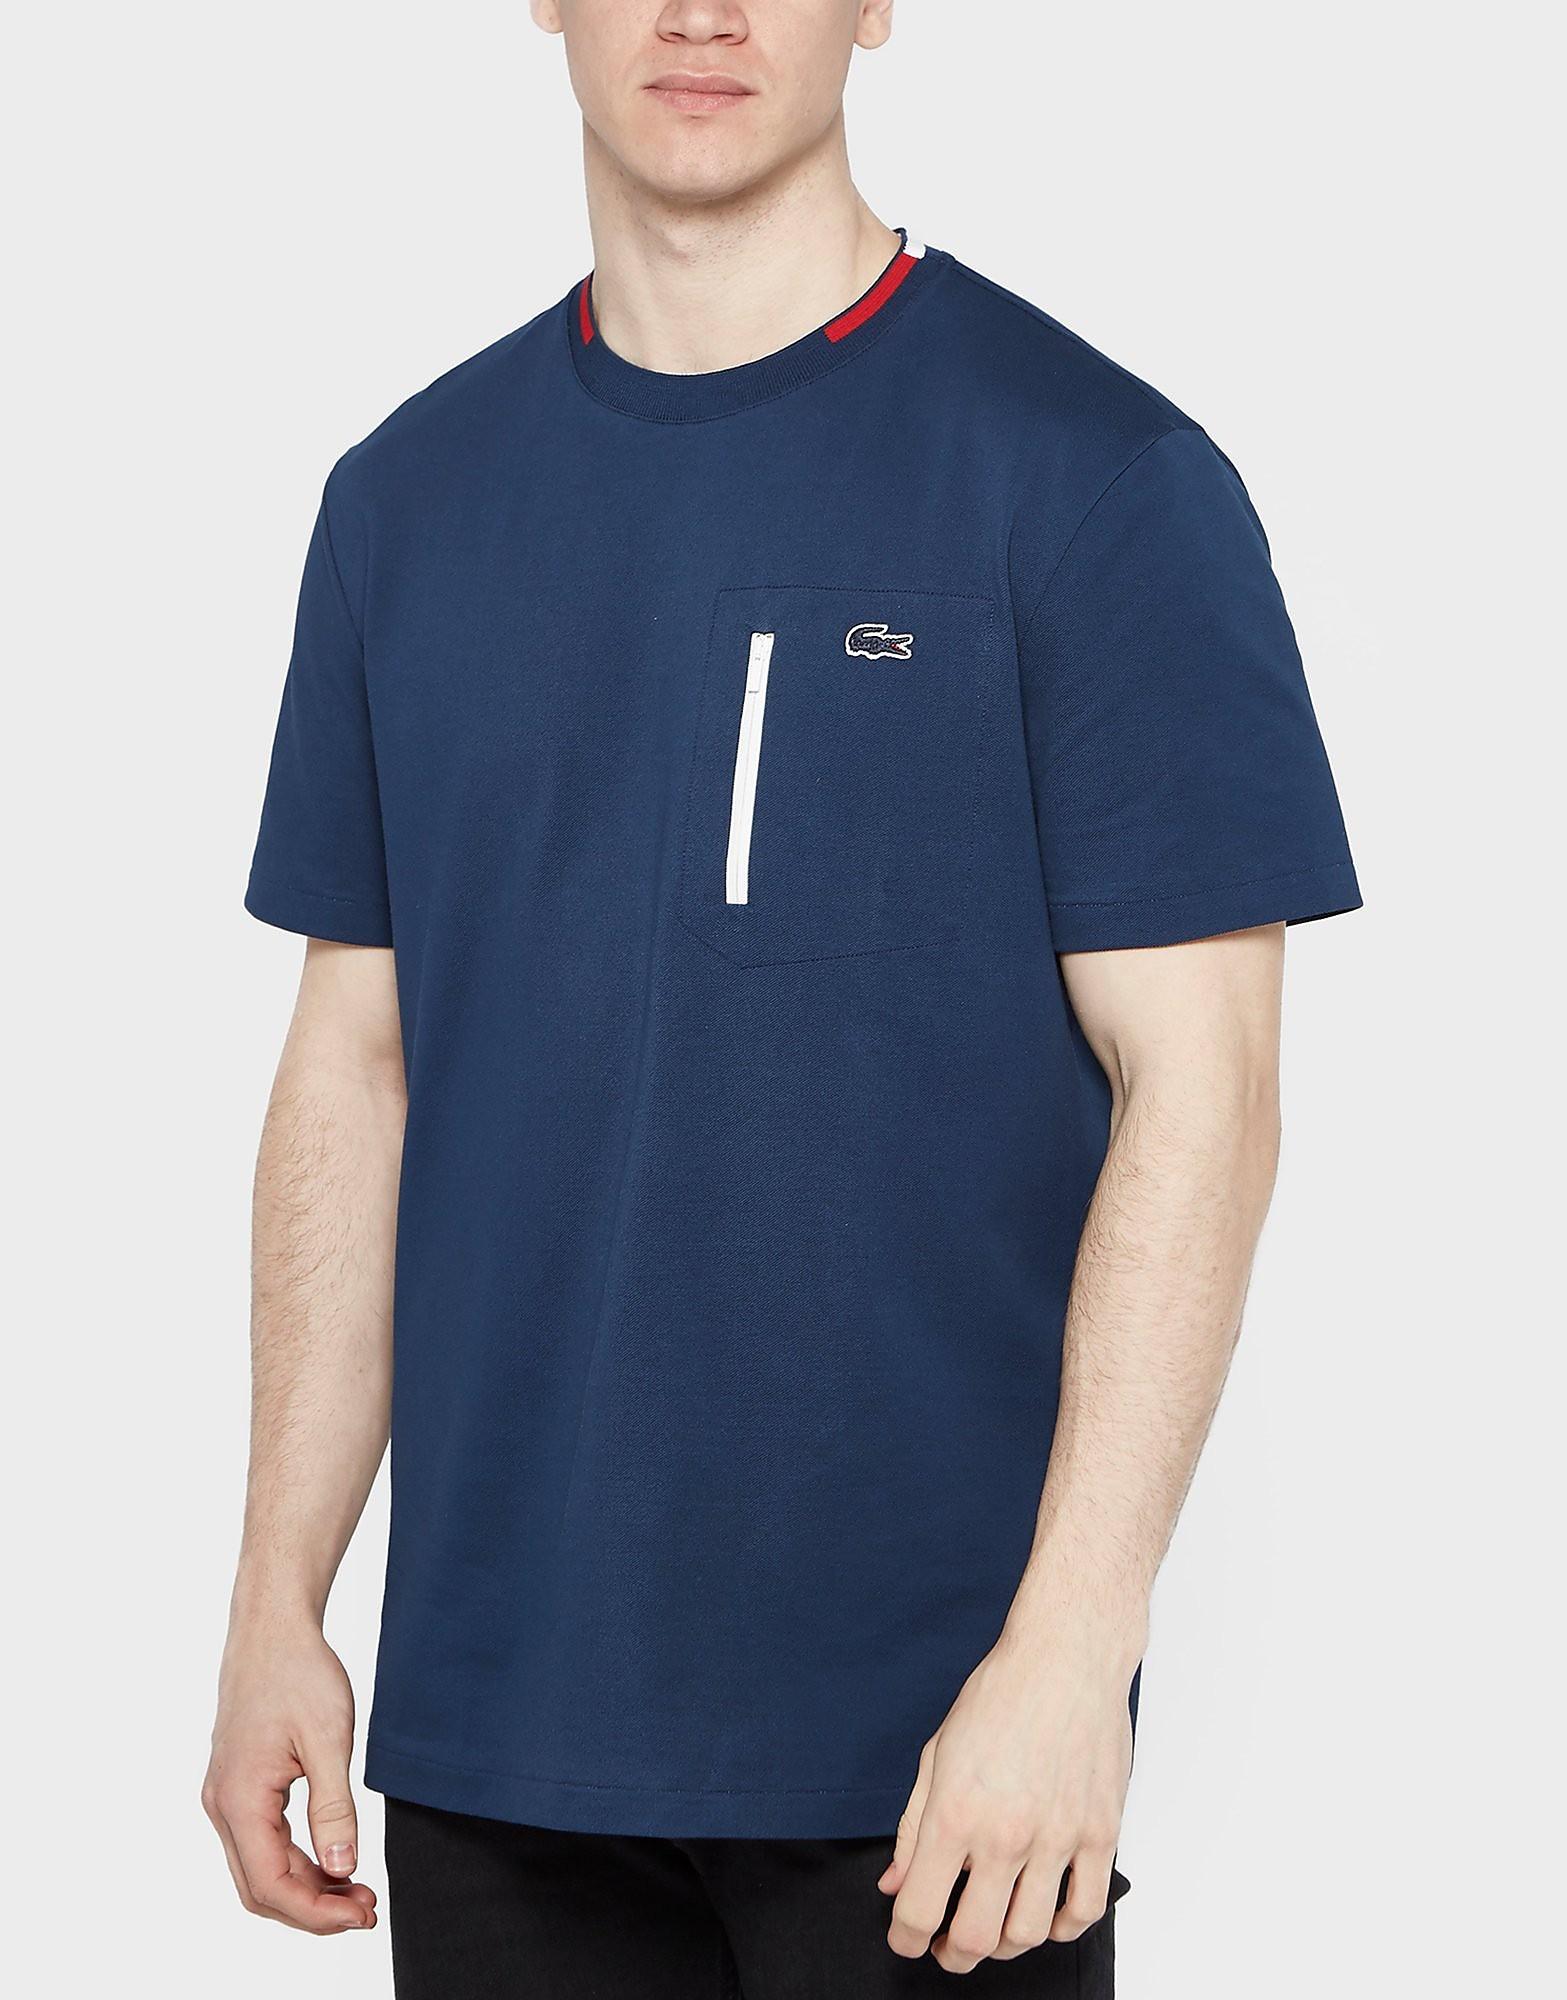 Lacoste Zip Pocket T-Shirt